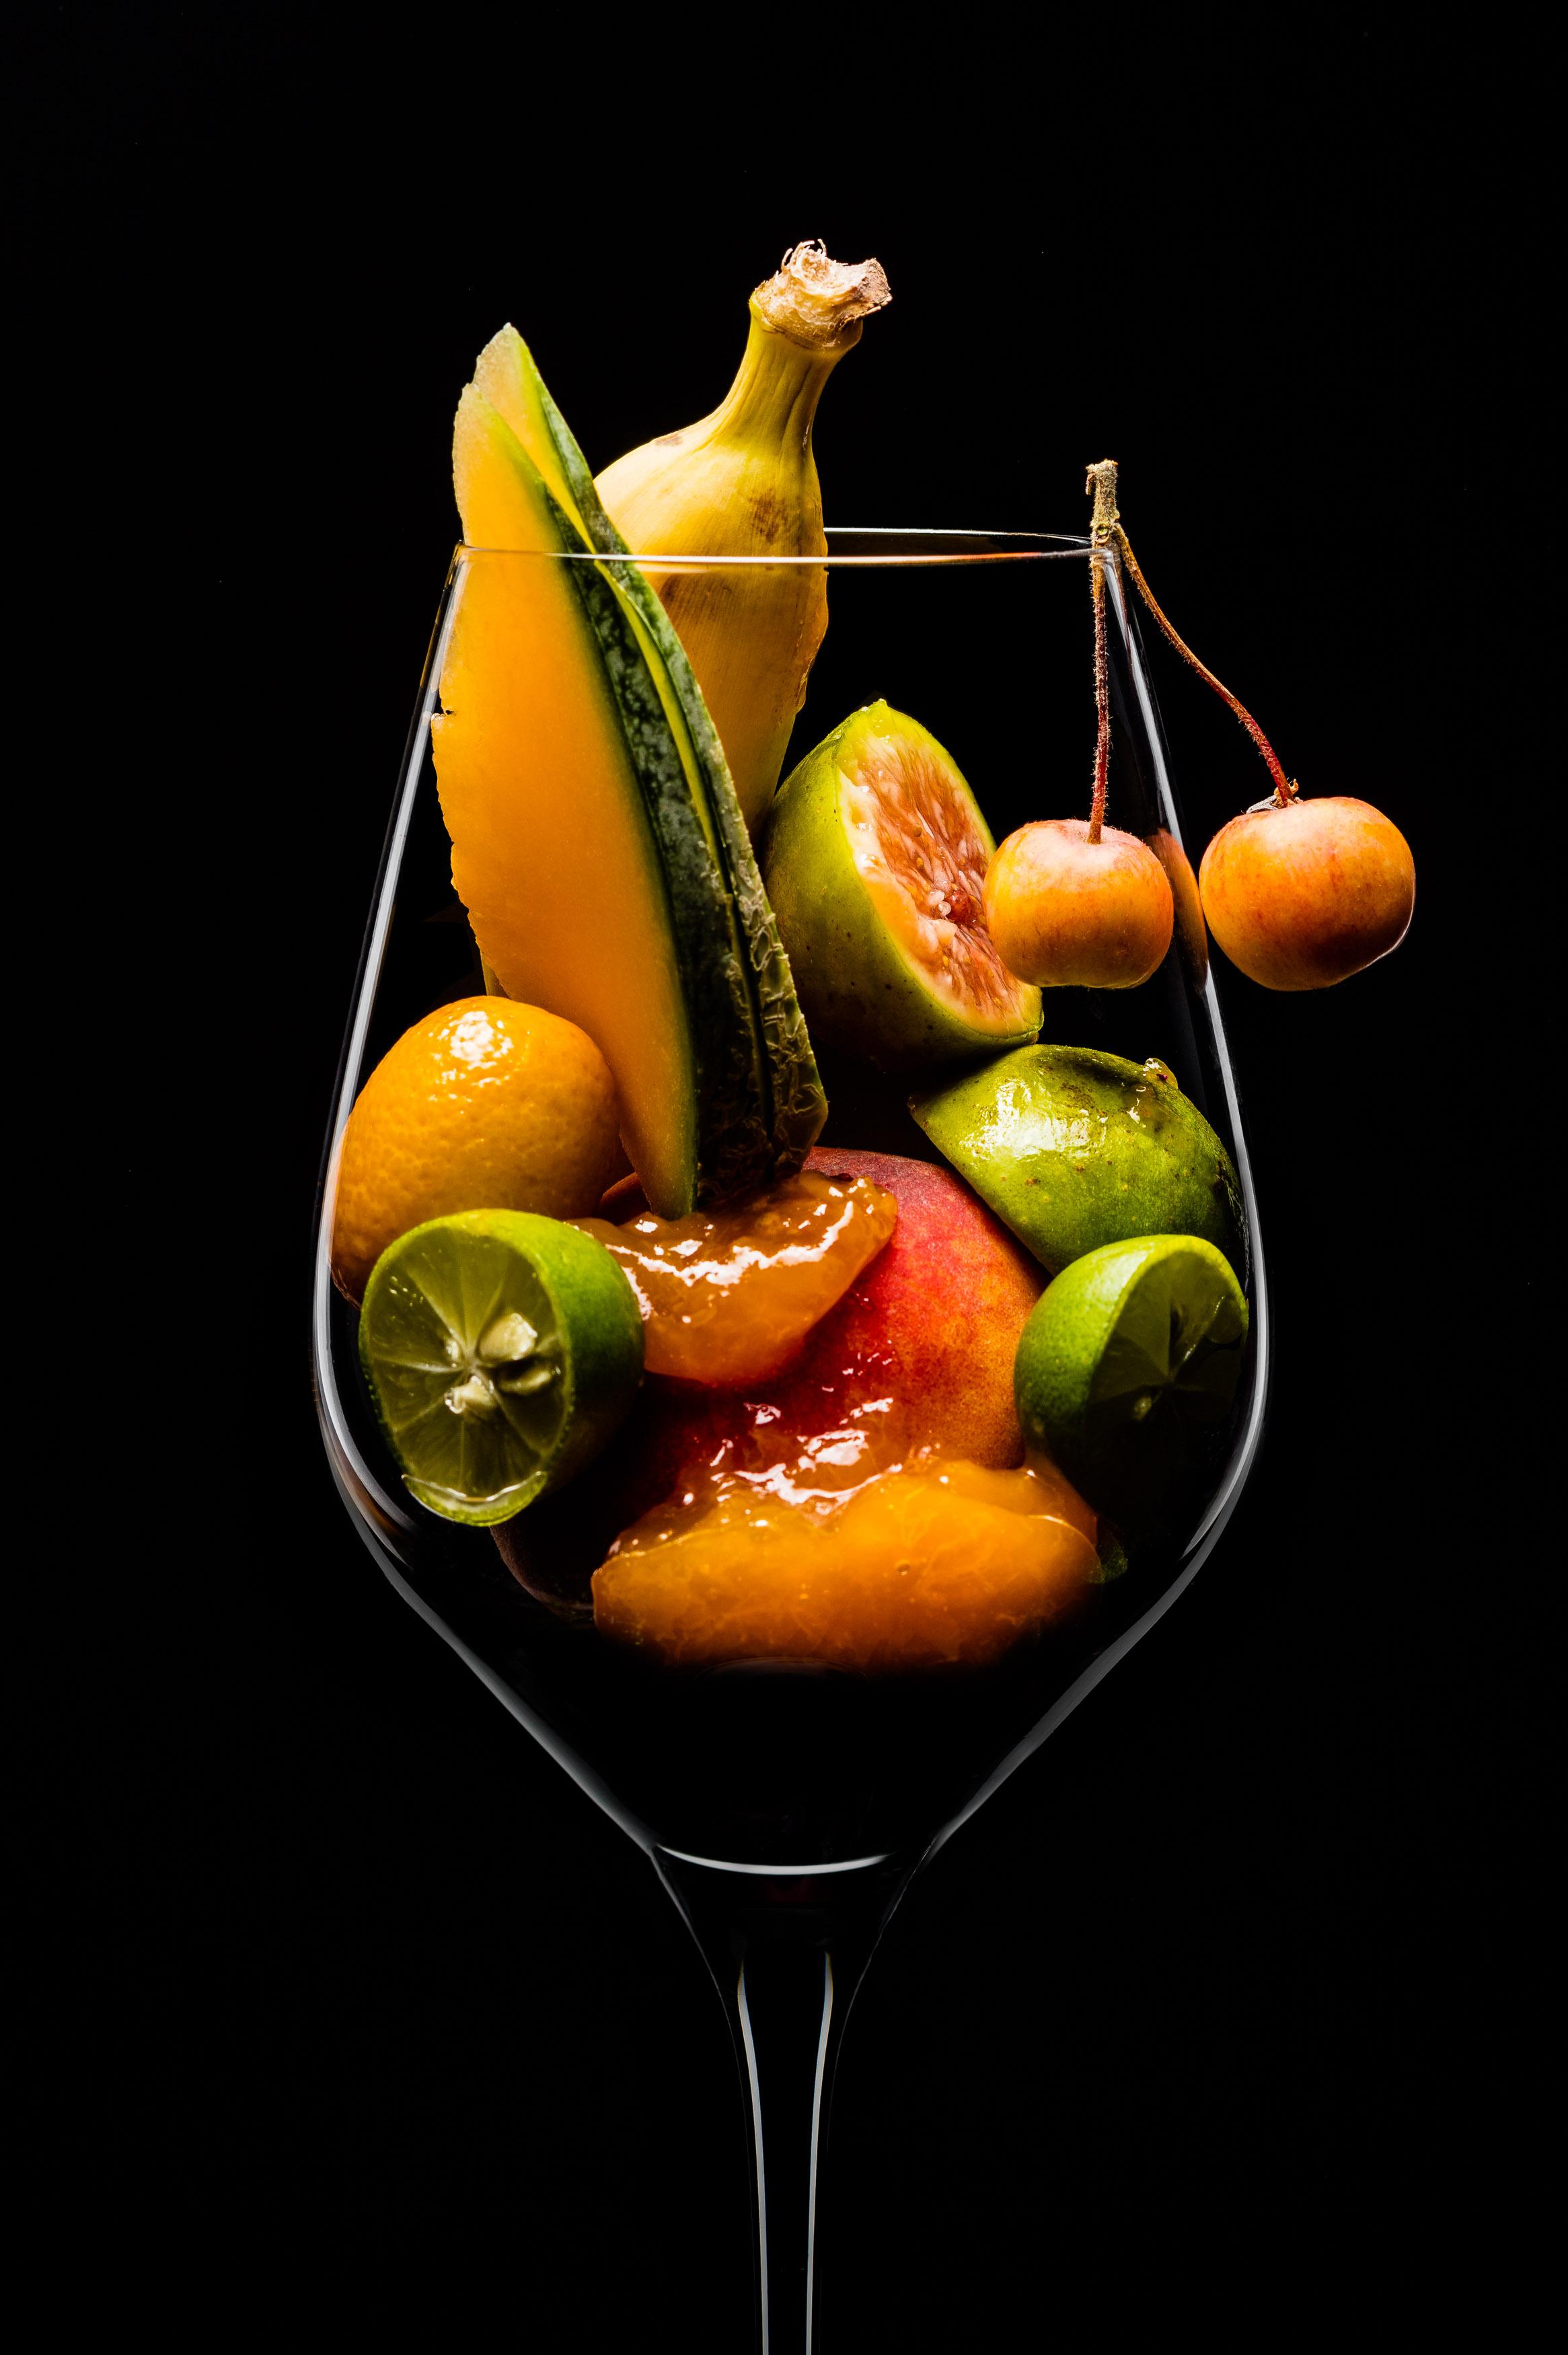 Crashkurs Wein 24: Chardonnay...